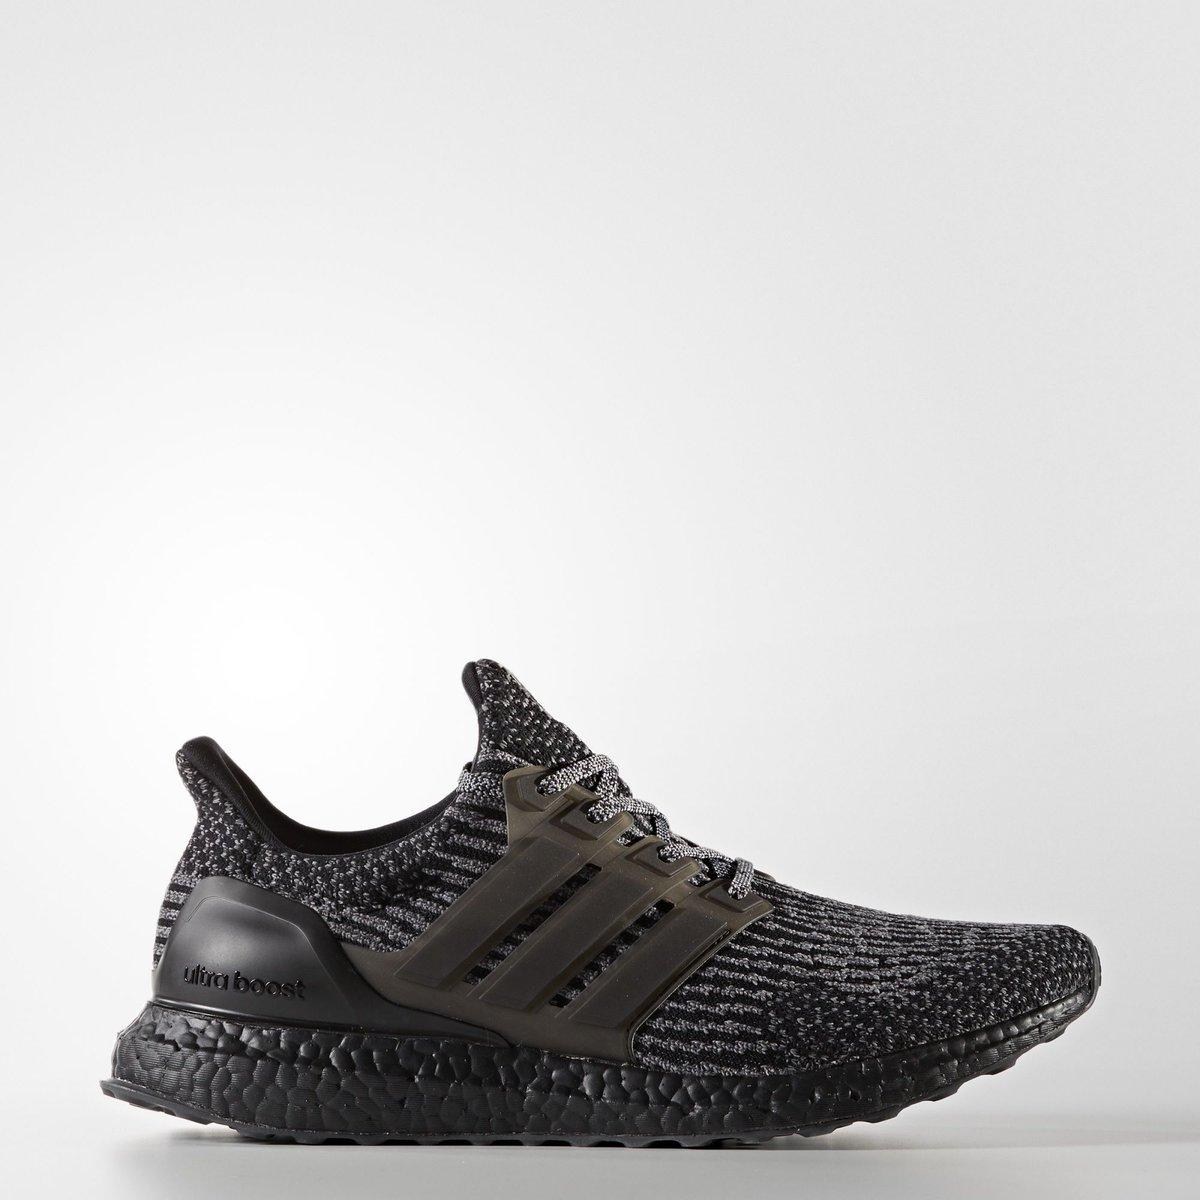 a4615e430 Adidas Ultra boost 3.0 Core Black   Core Black   Solid Grey BA8923 Price    200  http   www.adidas.com us ultraboost-shoes BA8923.htmlpic.twitter.com   ...